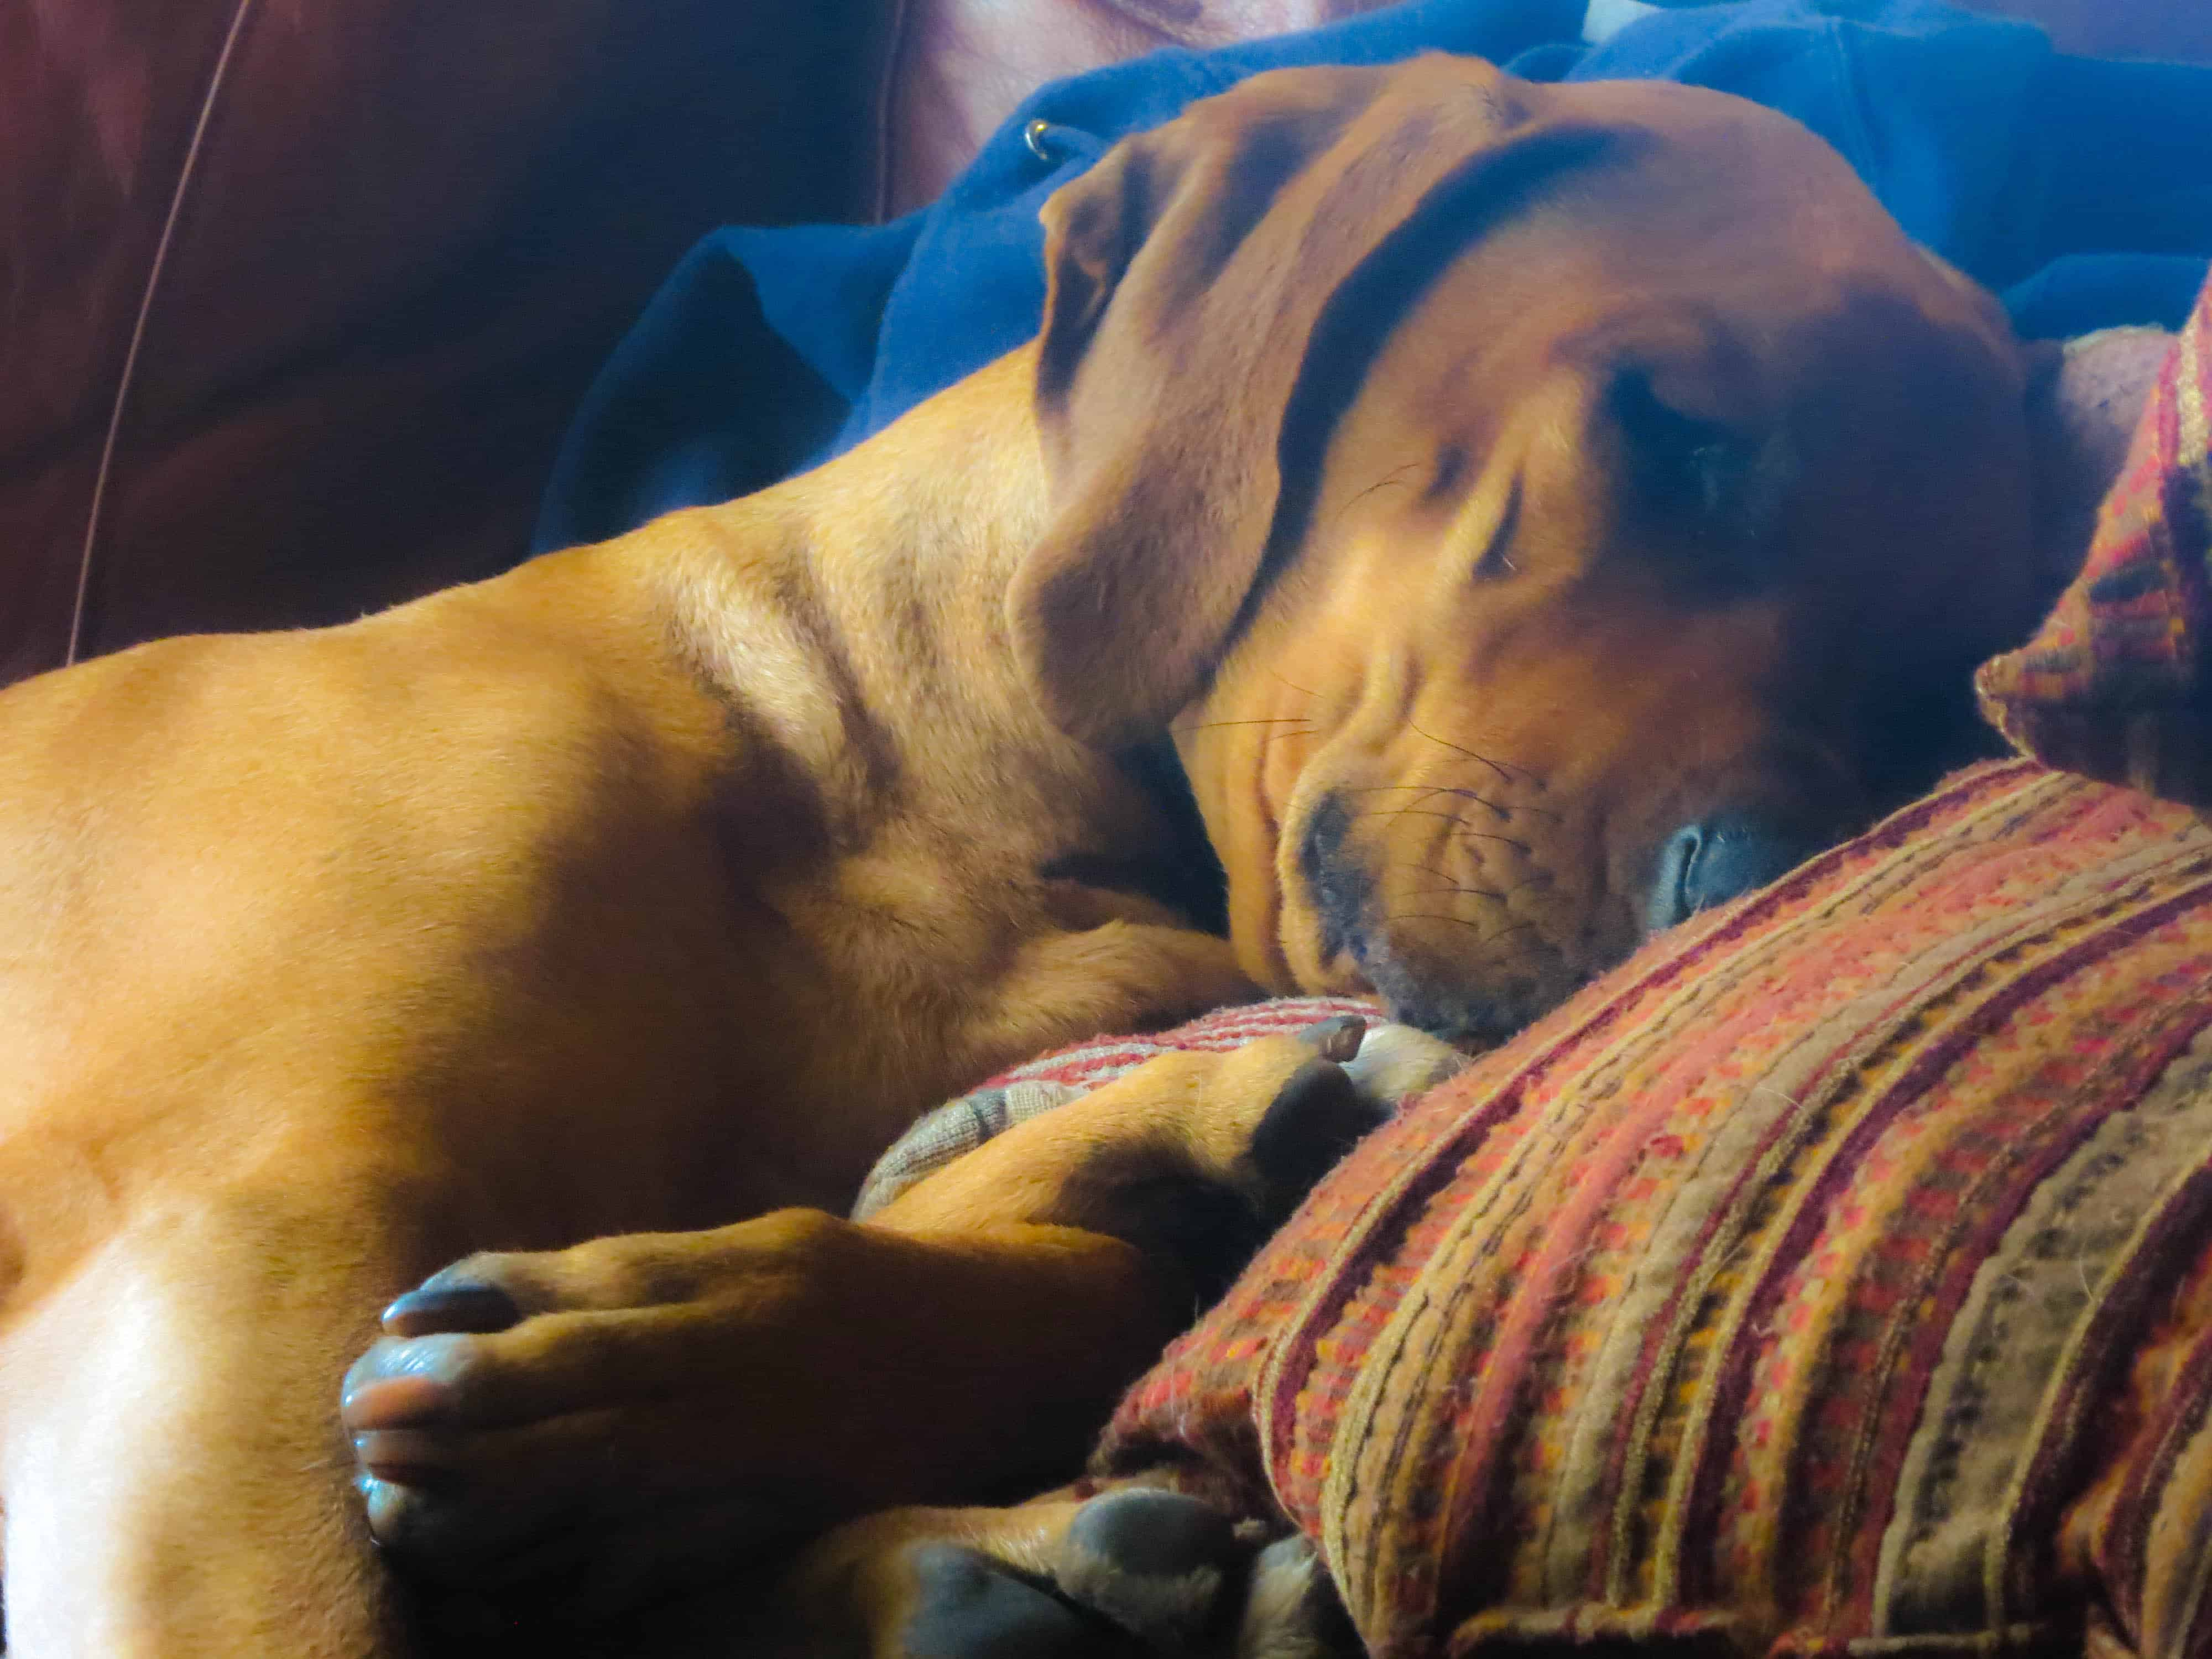 Rhodesian Ridgeback, pet adventure, dog blog, marking our territory, petcentric